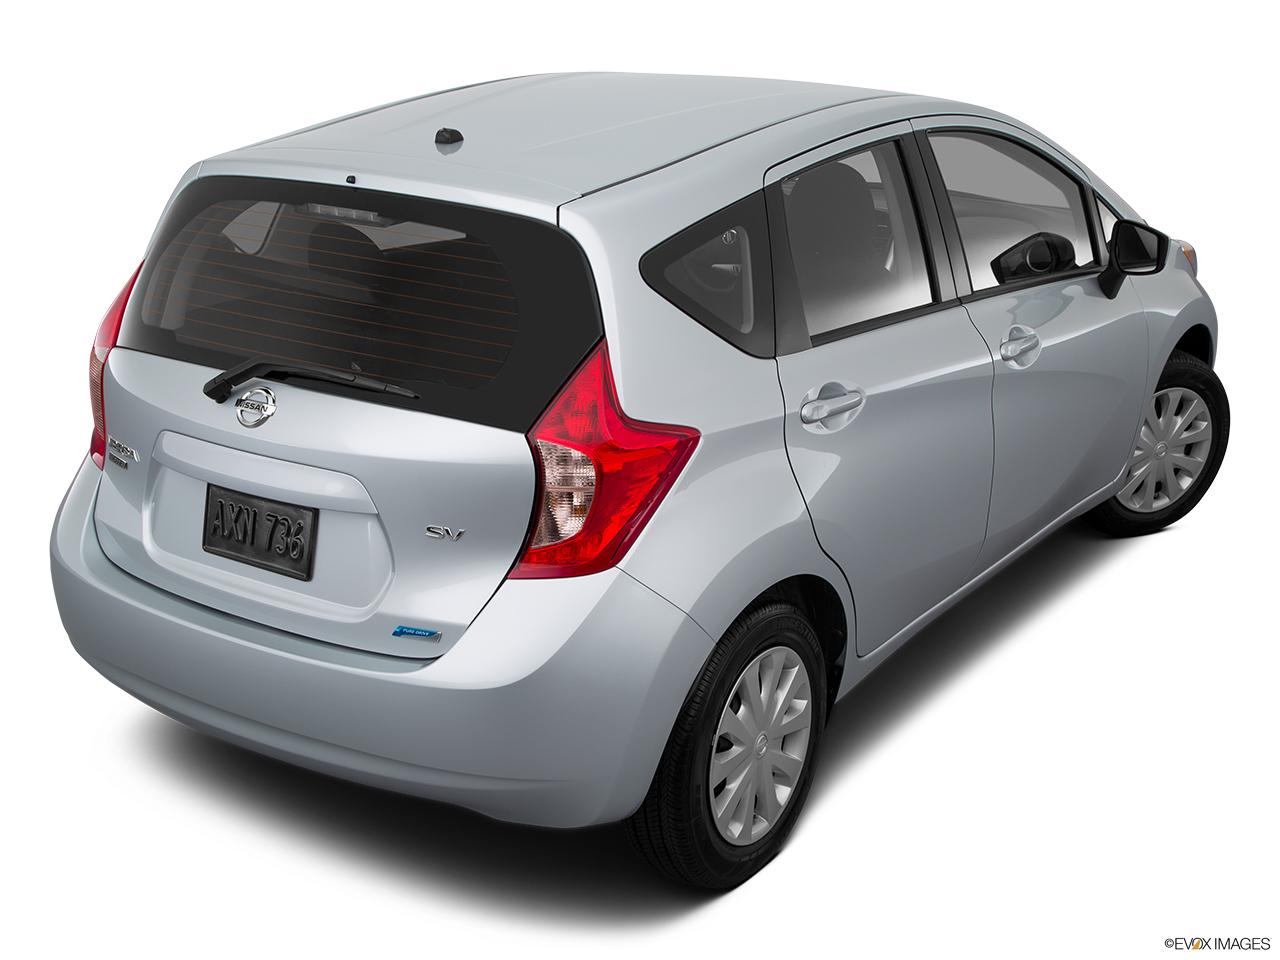 2015 Nissan Versa Note 5 Door CVT 1.6 SV Hatchback - Rear ...